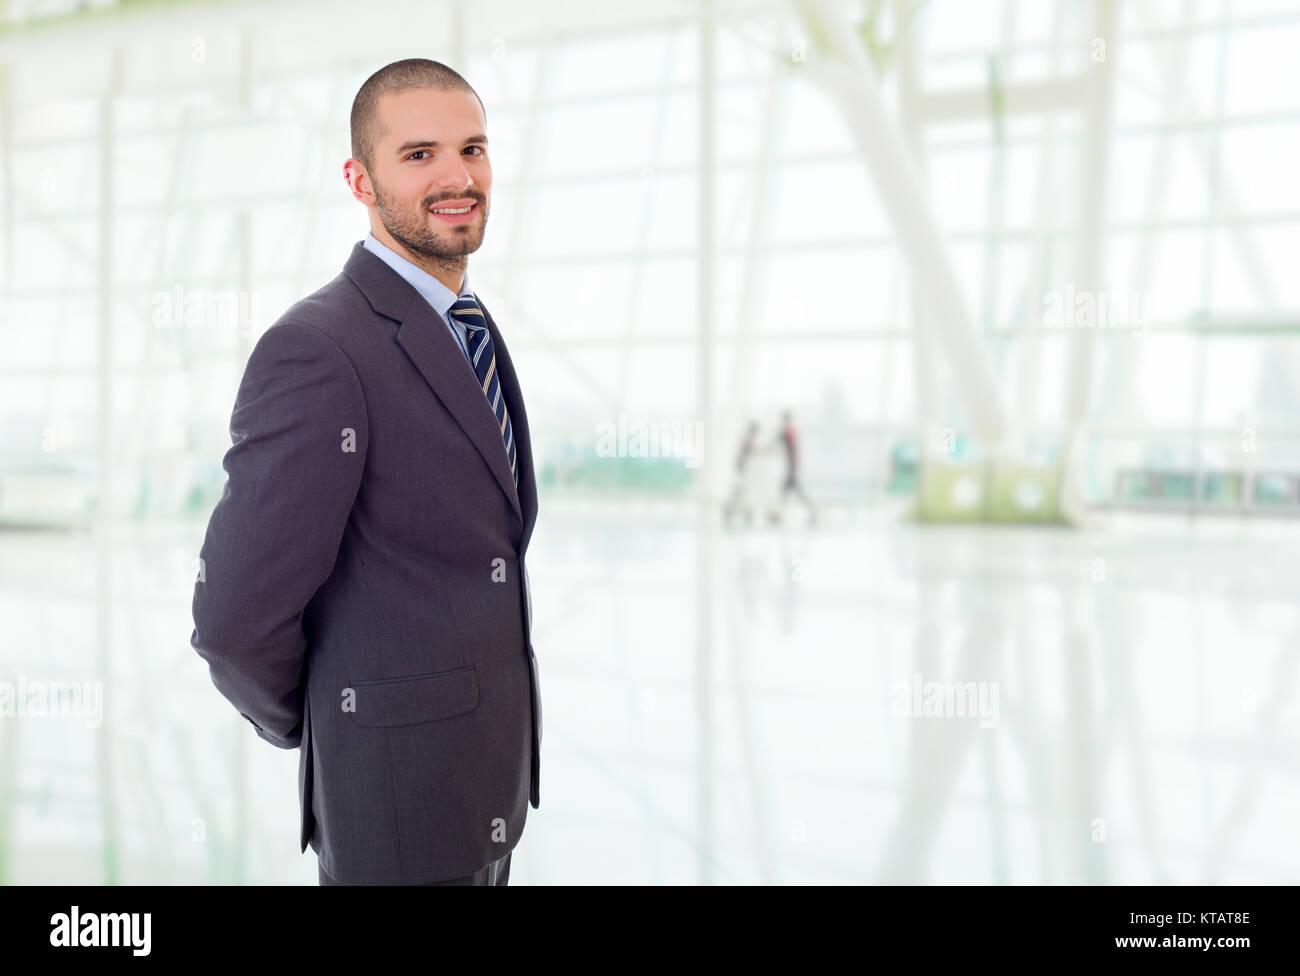 business man - Stock Image